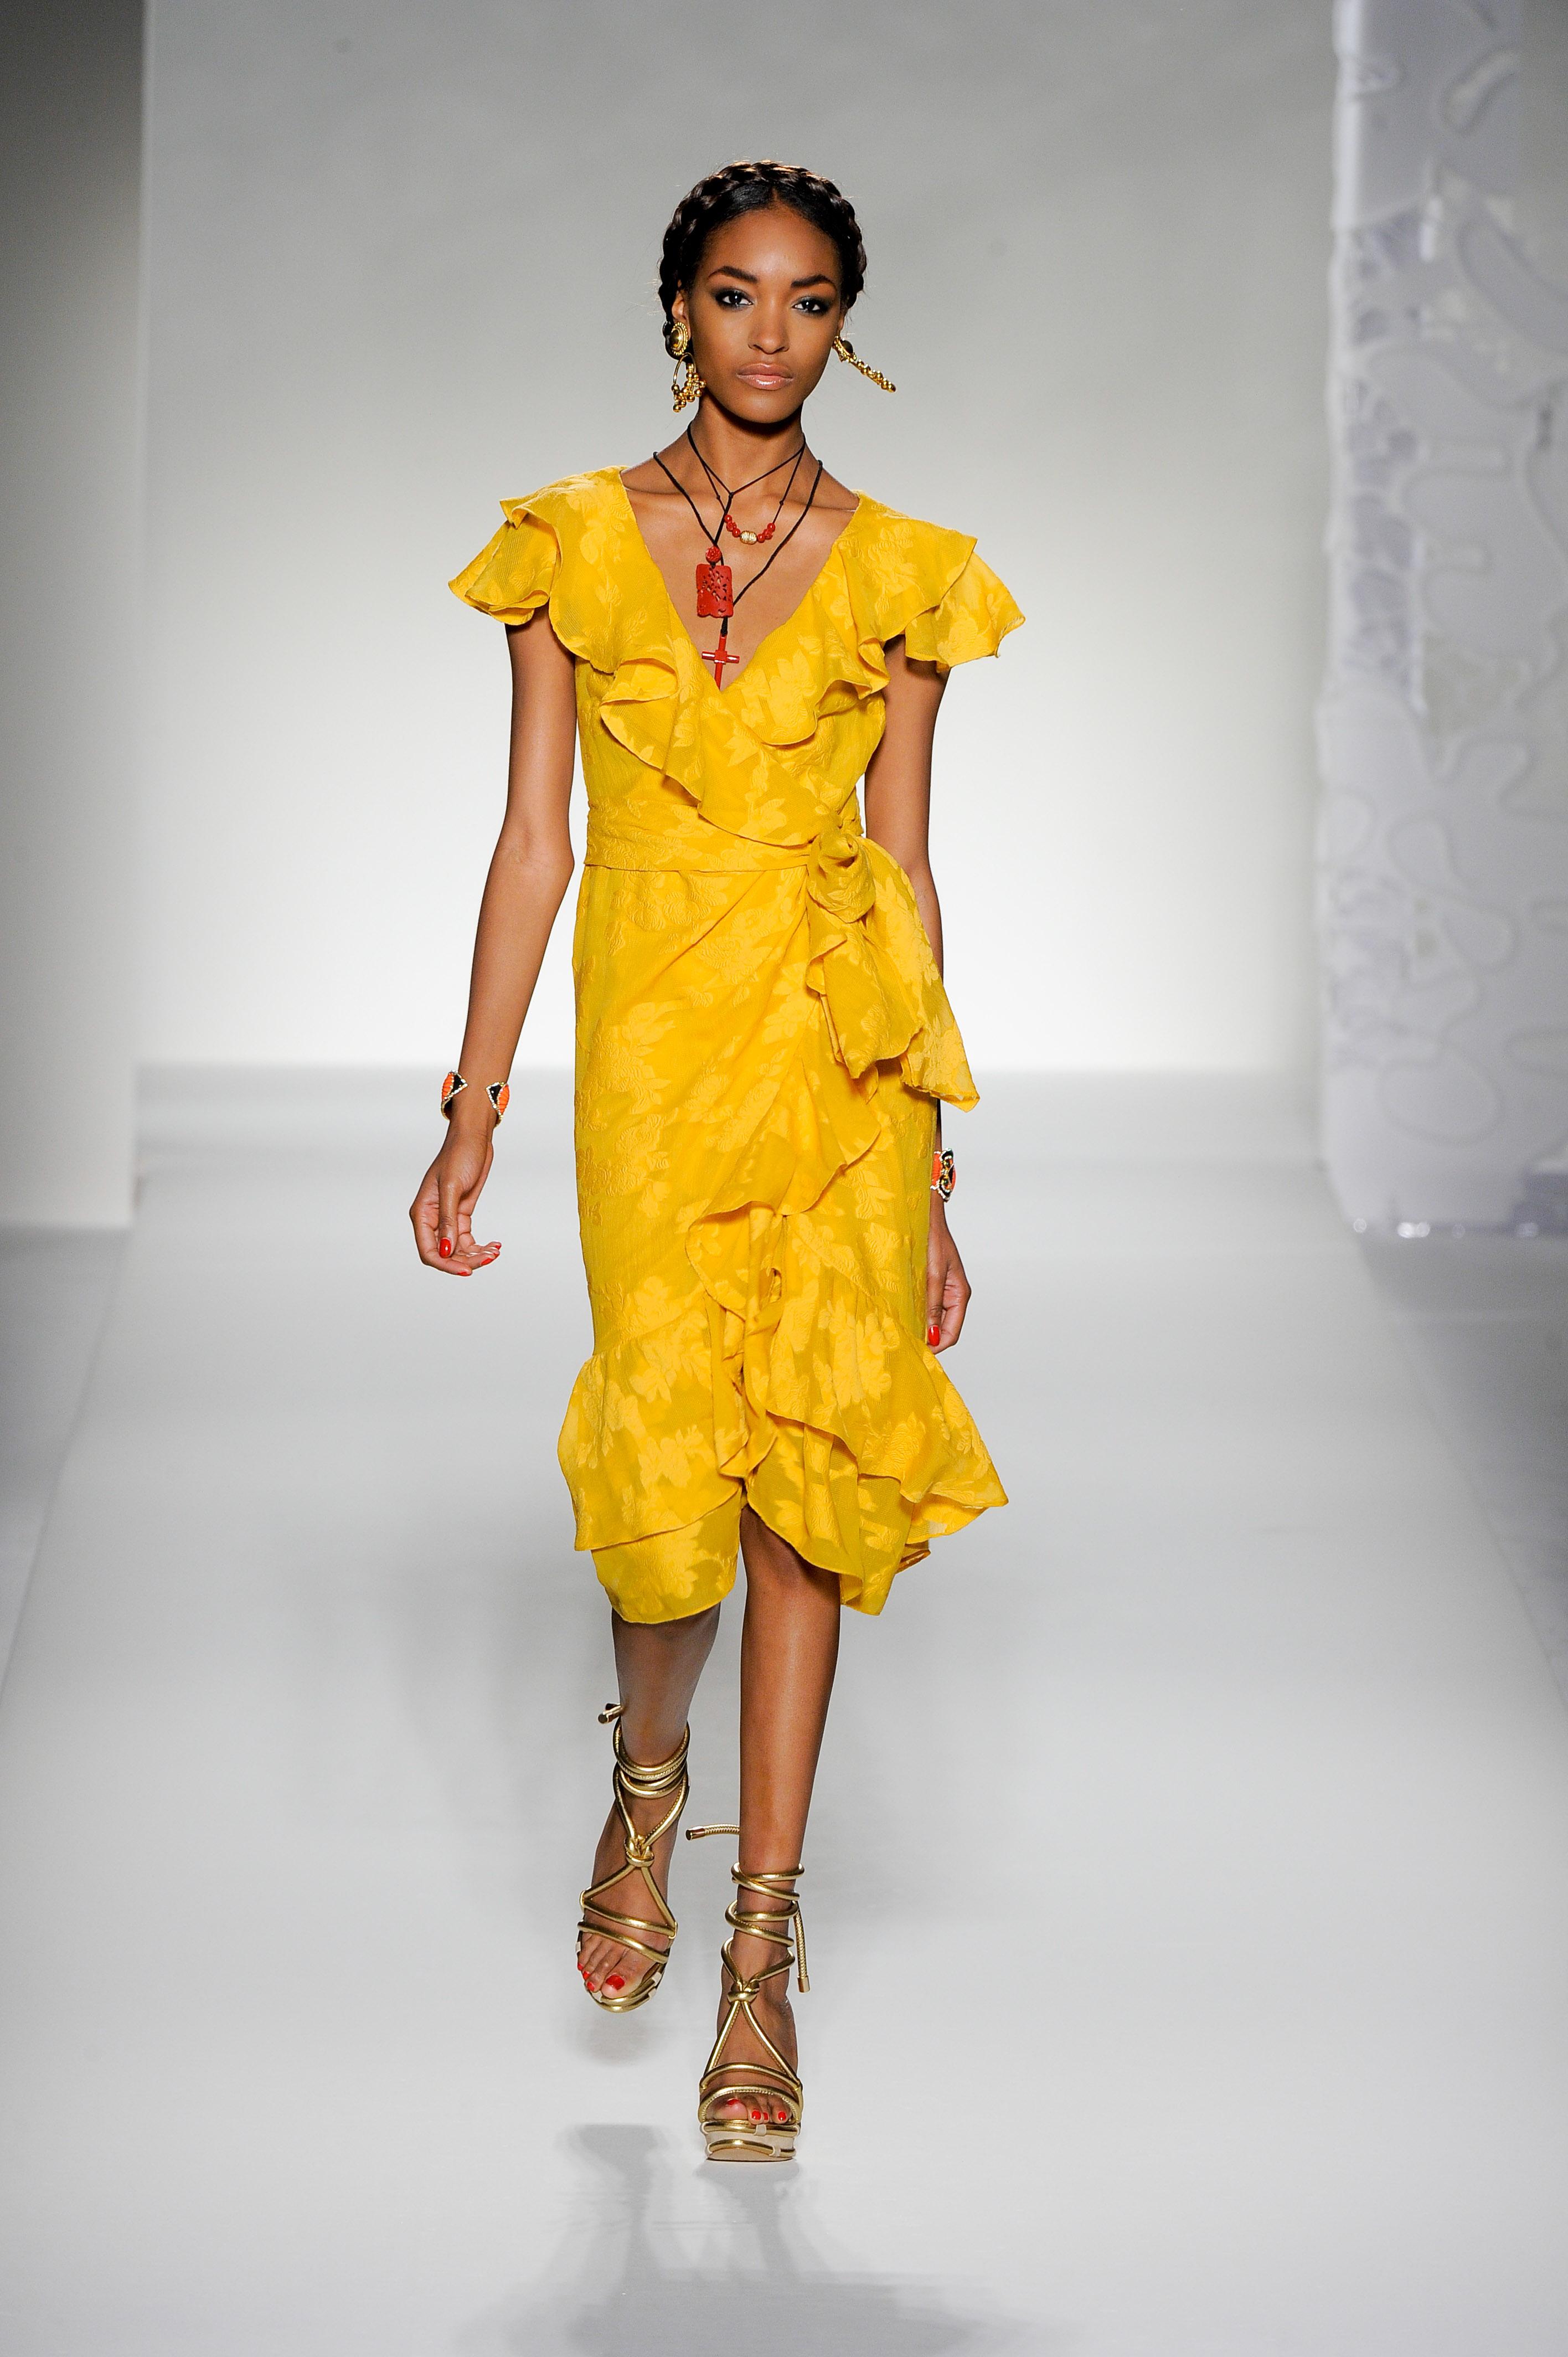 8c56d7009081 Τα 10 πιο hot trends του σήμερα και πως να τα φορέσεις... - TLIFE